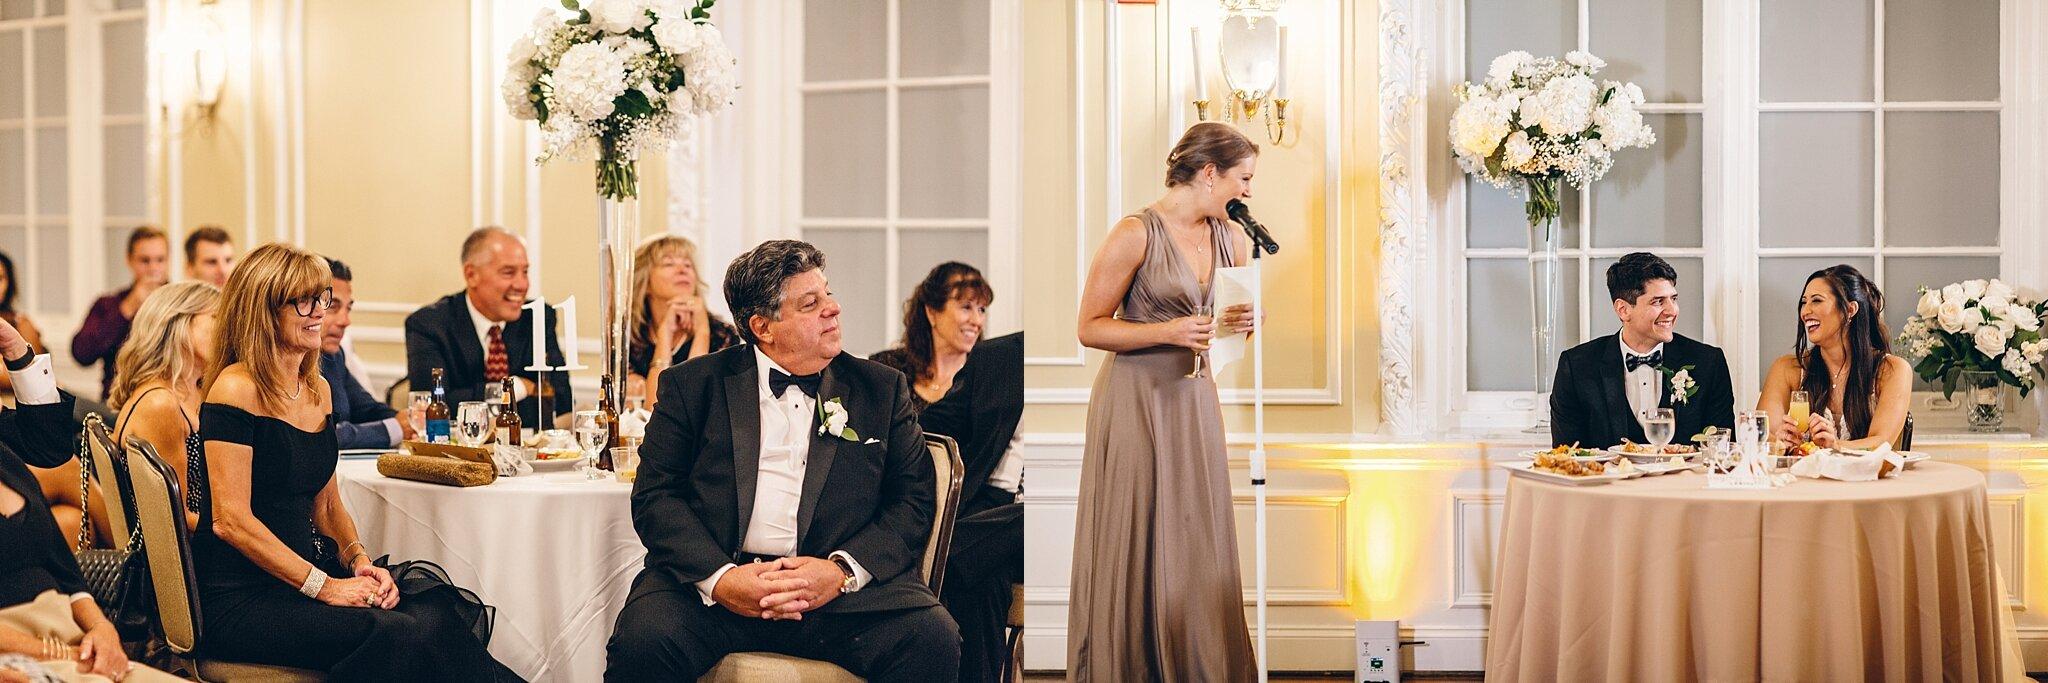 patrick-henry-ballroom-wedding-roanoke_0534.jpg